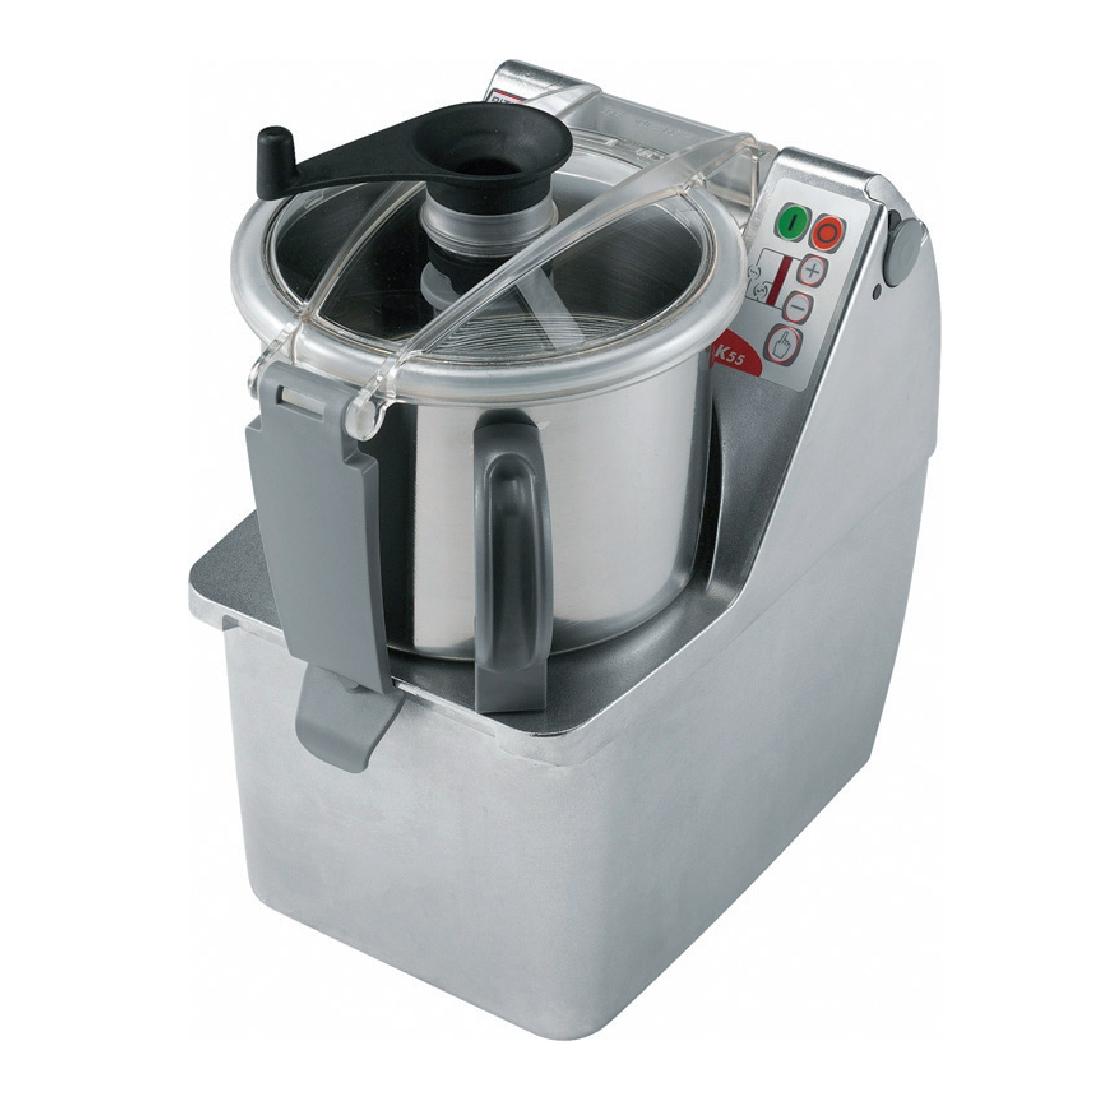 Food Processor - K45VS